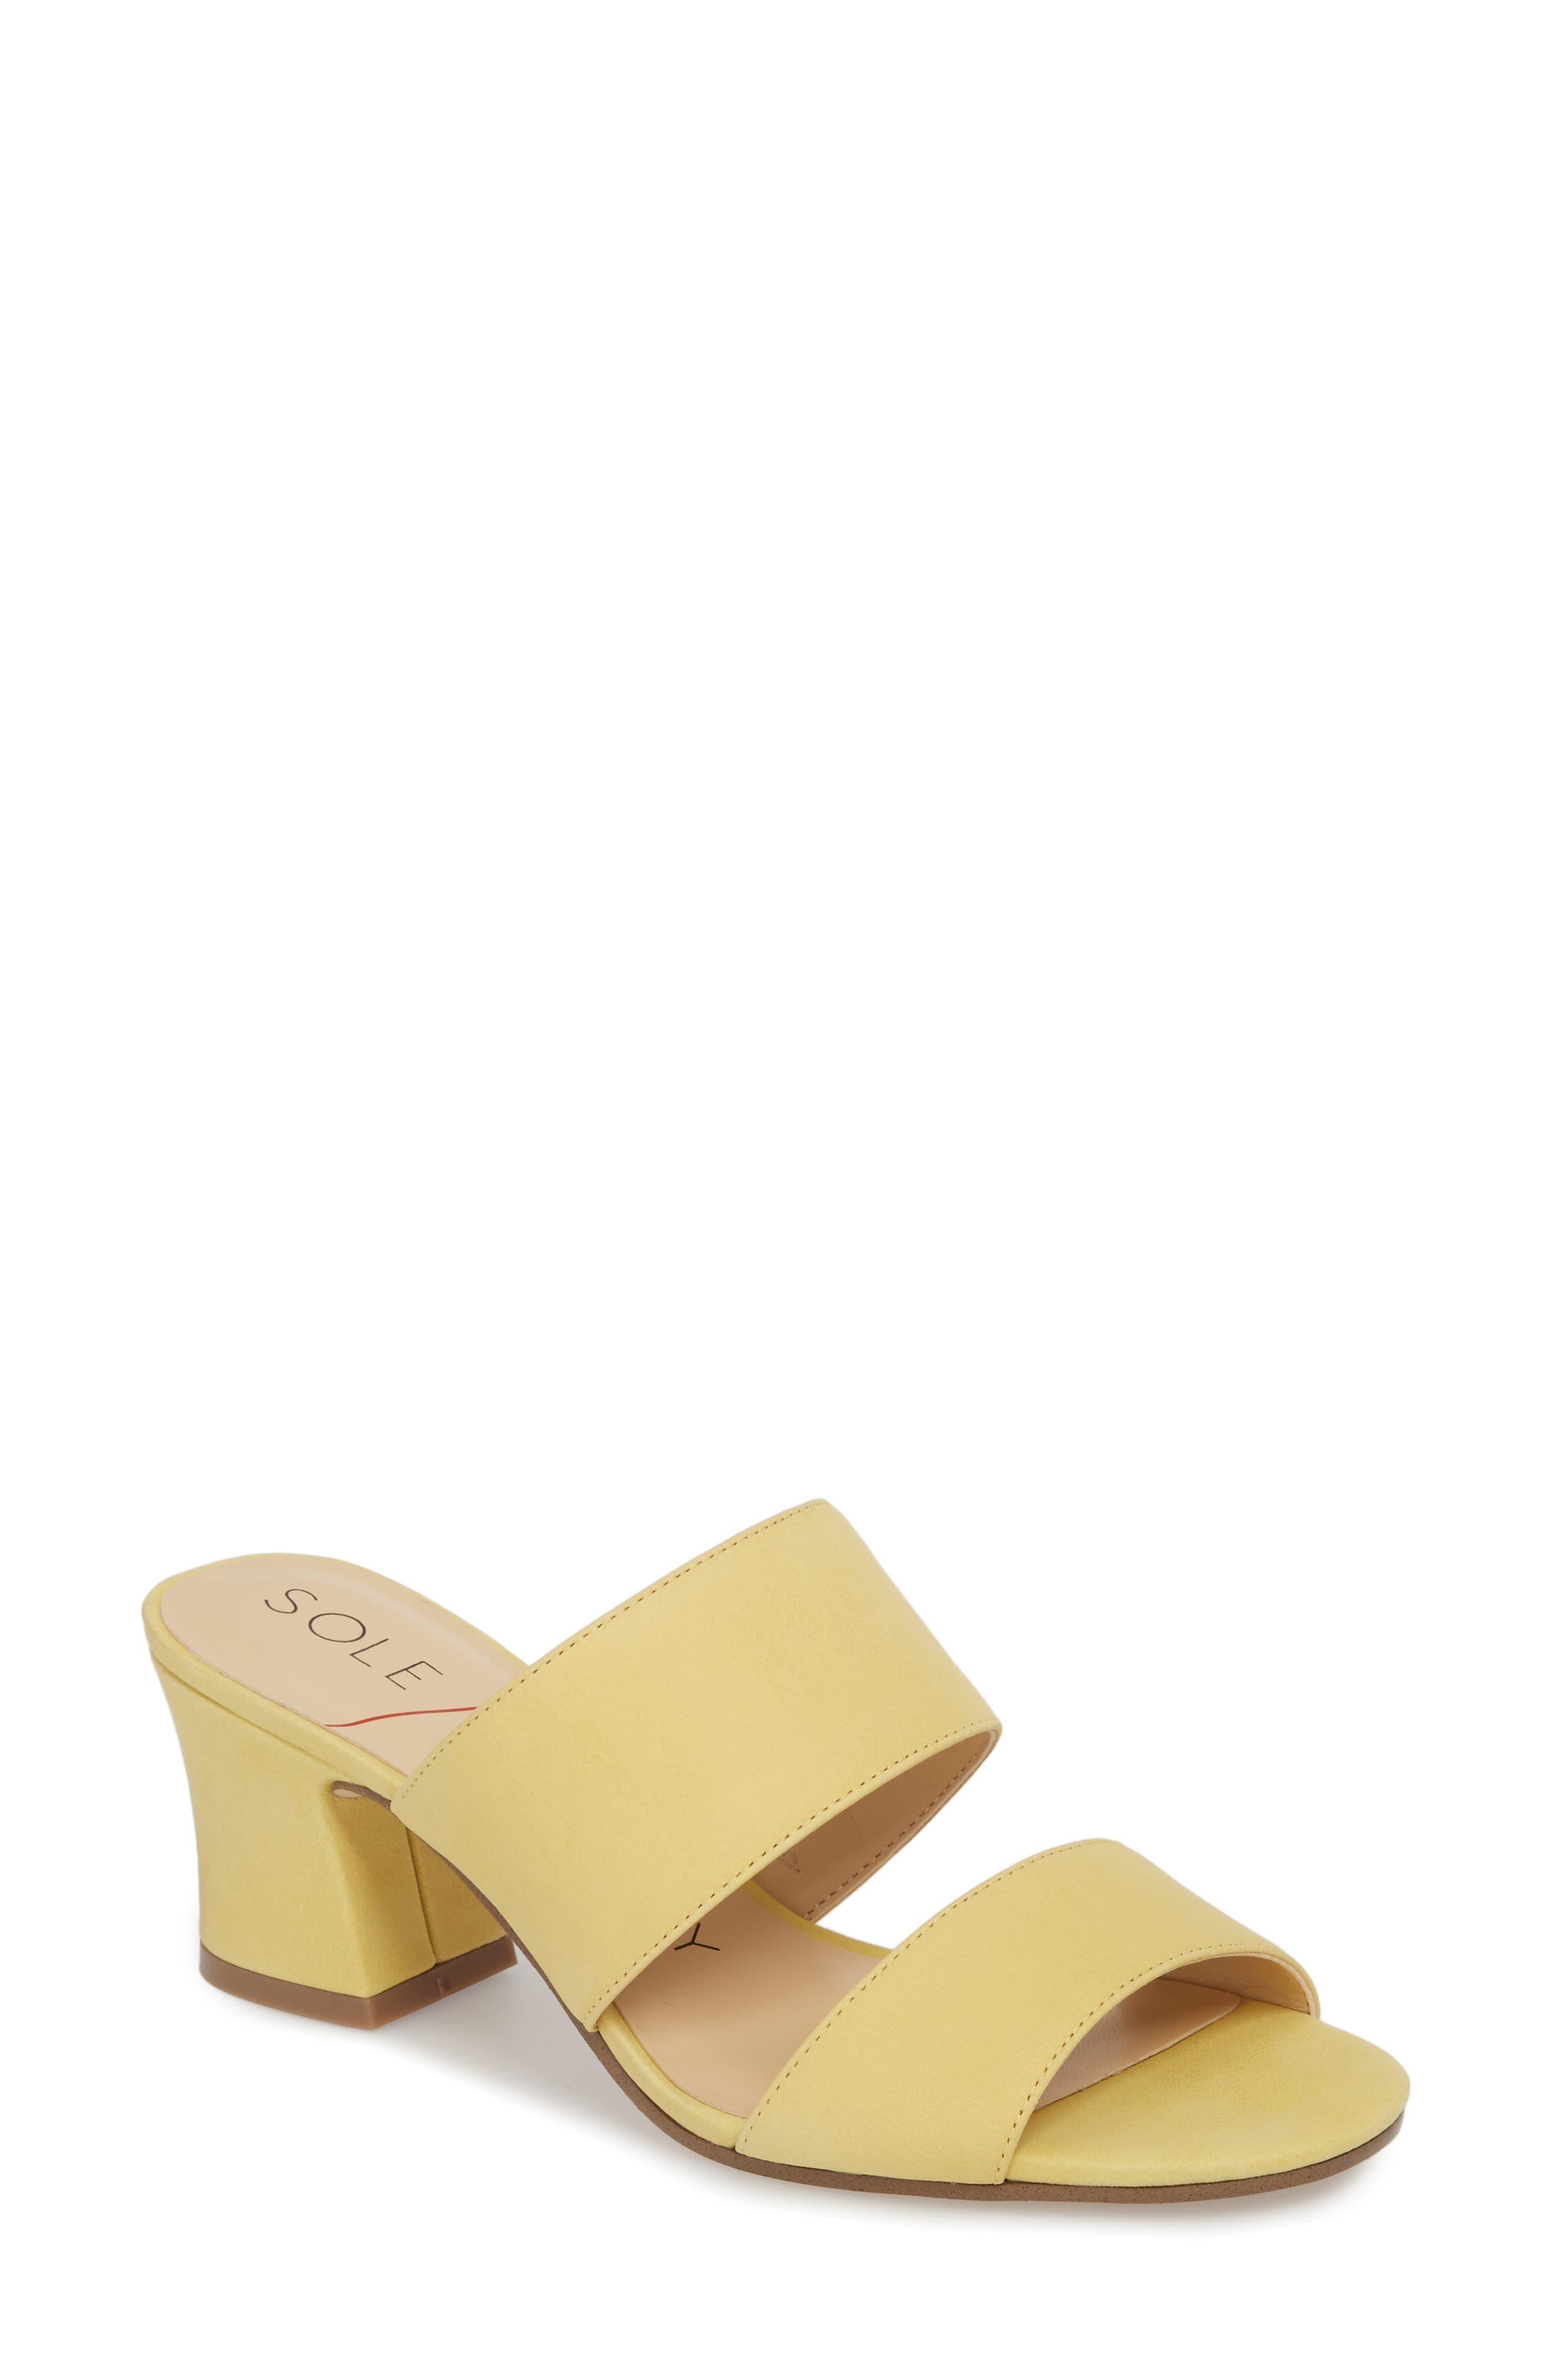 Heline Slide Sandal,                         Main,                         color, Pale Yellow